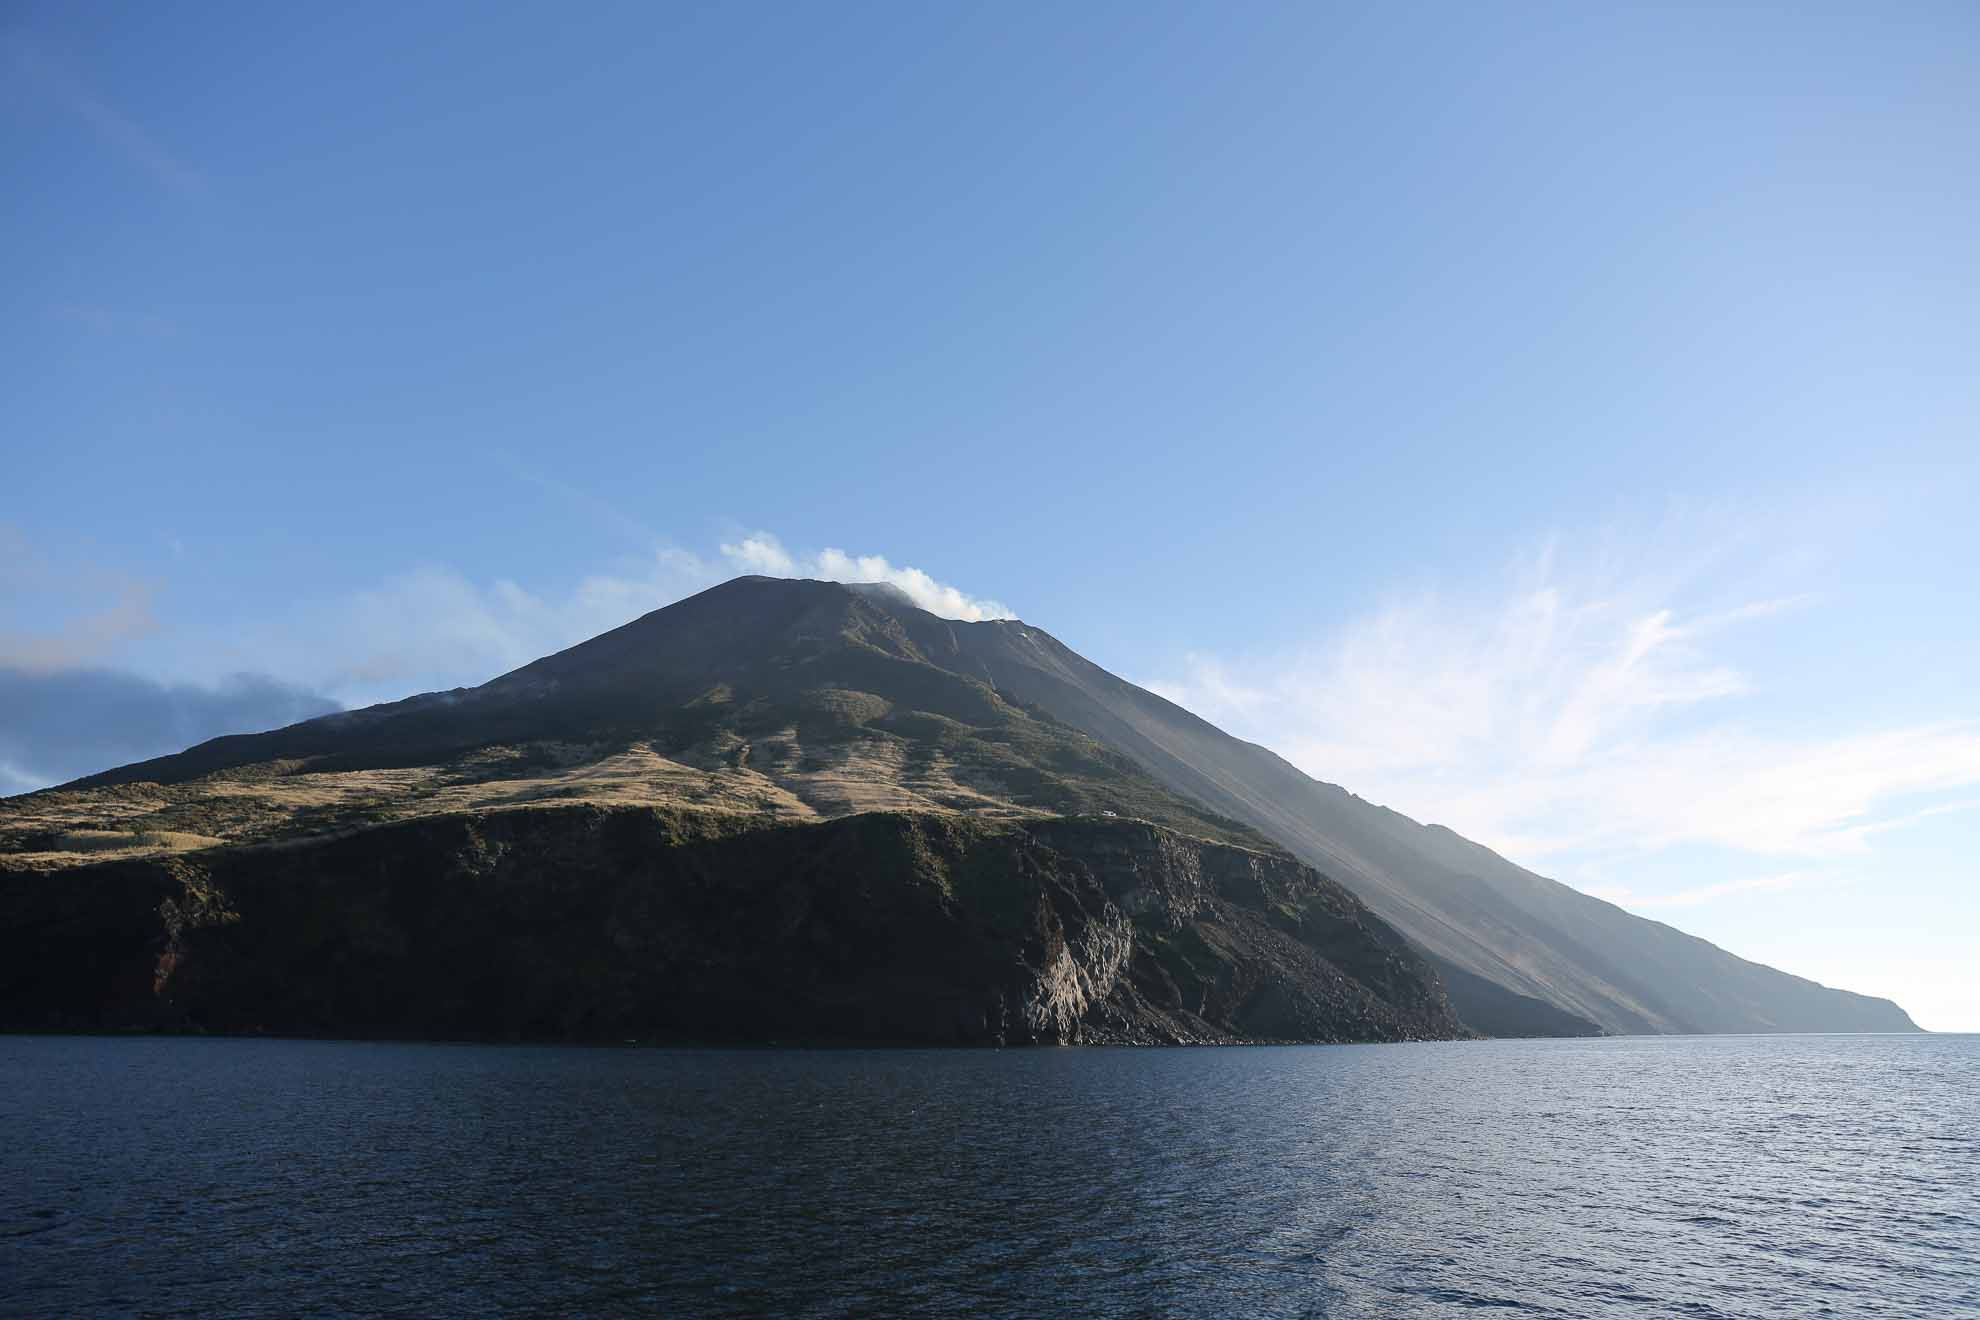 Der Vulkan ist bekanntermaßen regelmäßig auf geringem Niveau aktiv.